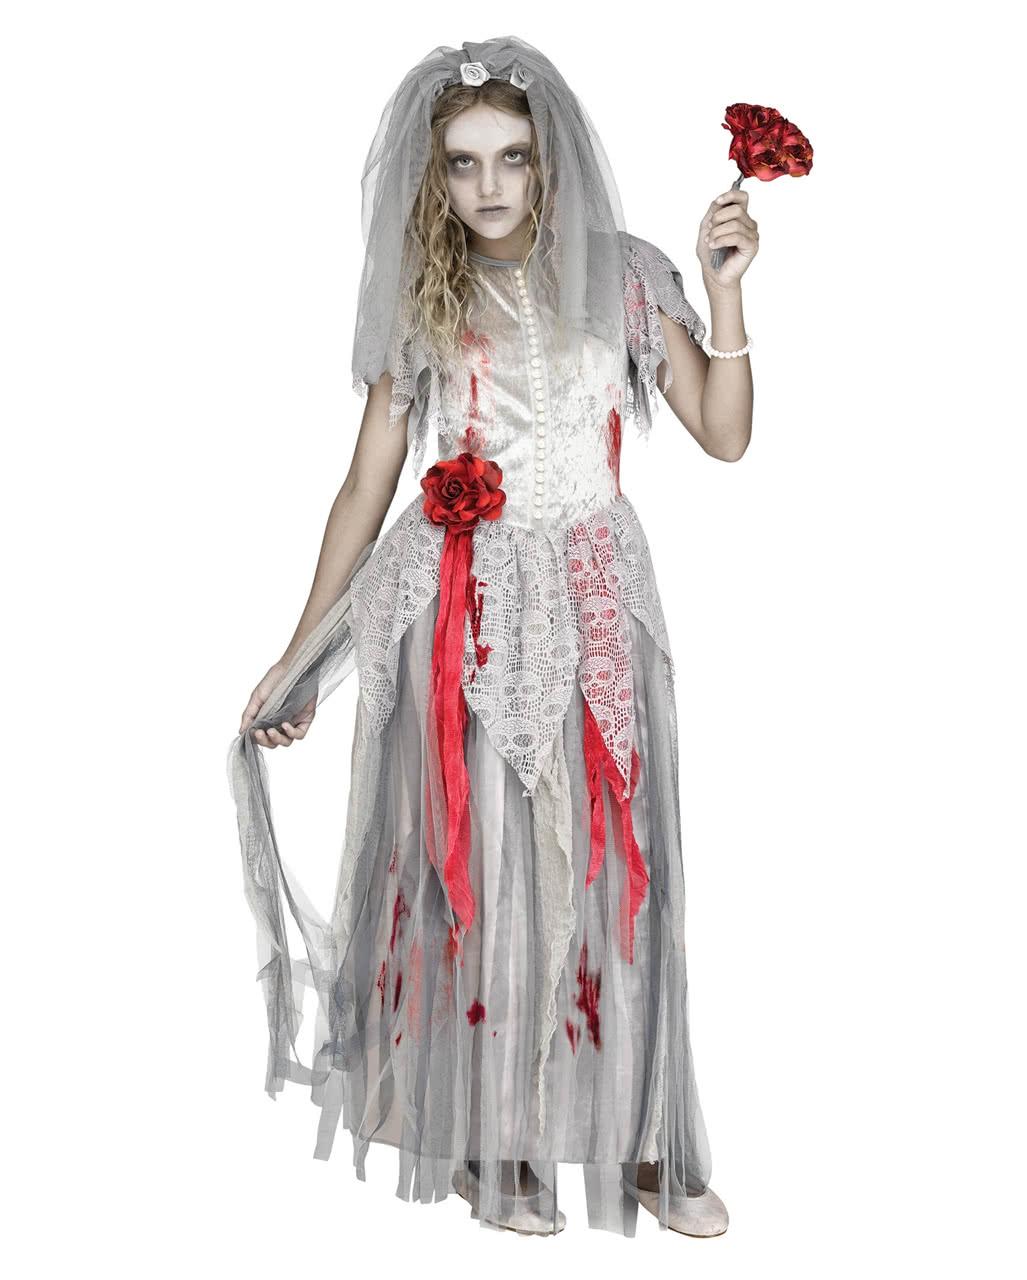 kinderkost m zombie braut f r halloween karneval universe. Black Bedroom Furniture Sets. Home Design Ideas